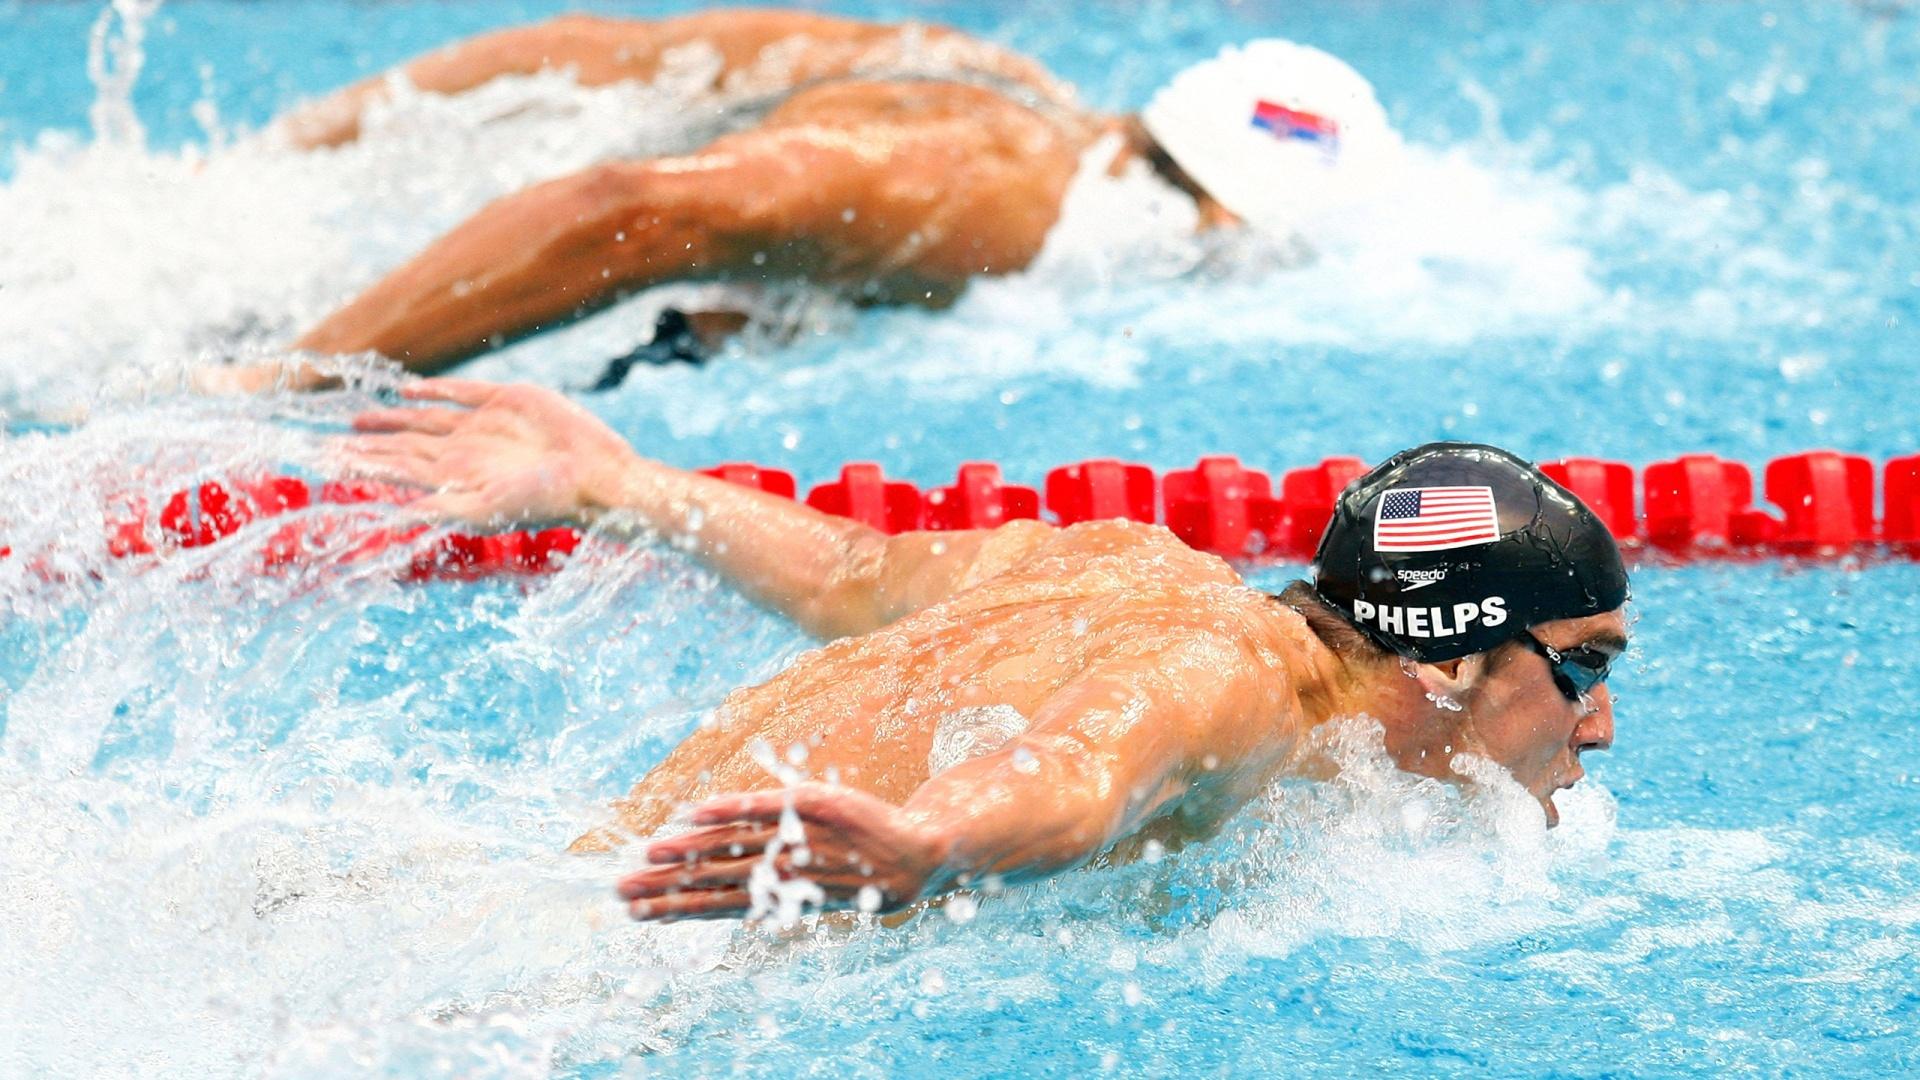 Michael Phelps Swimming